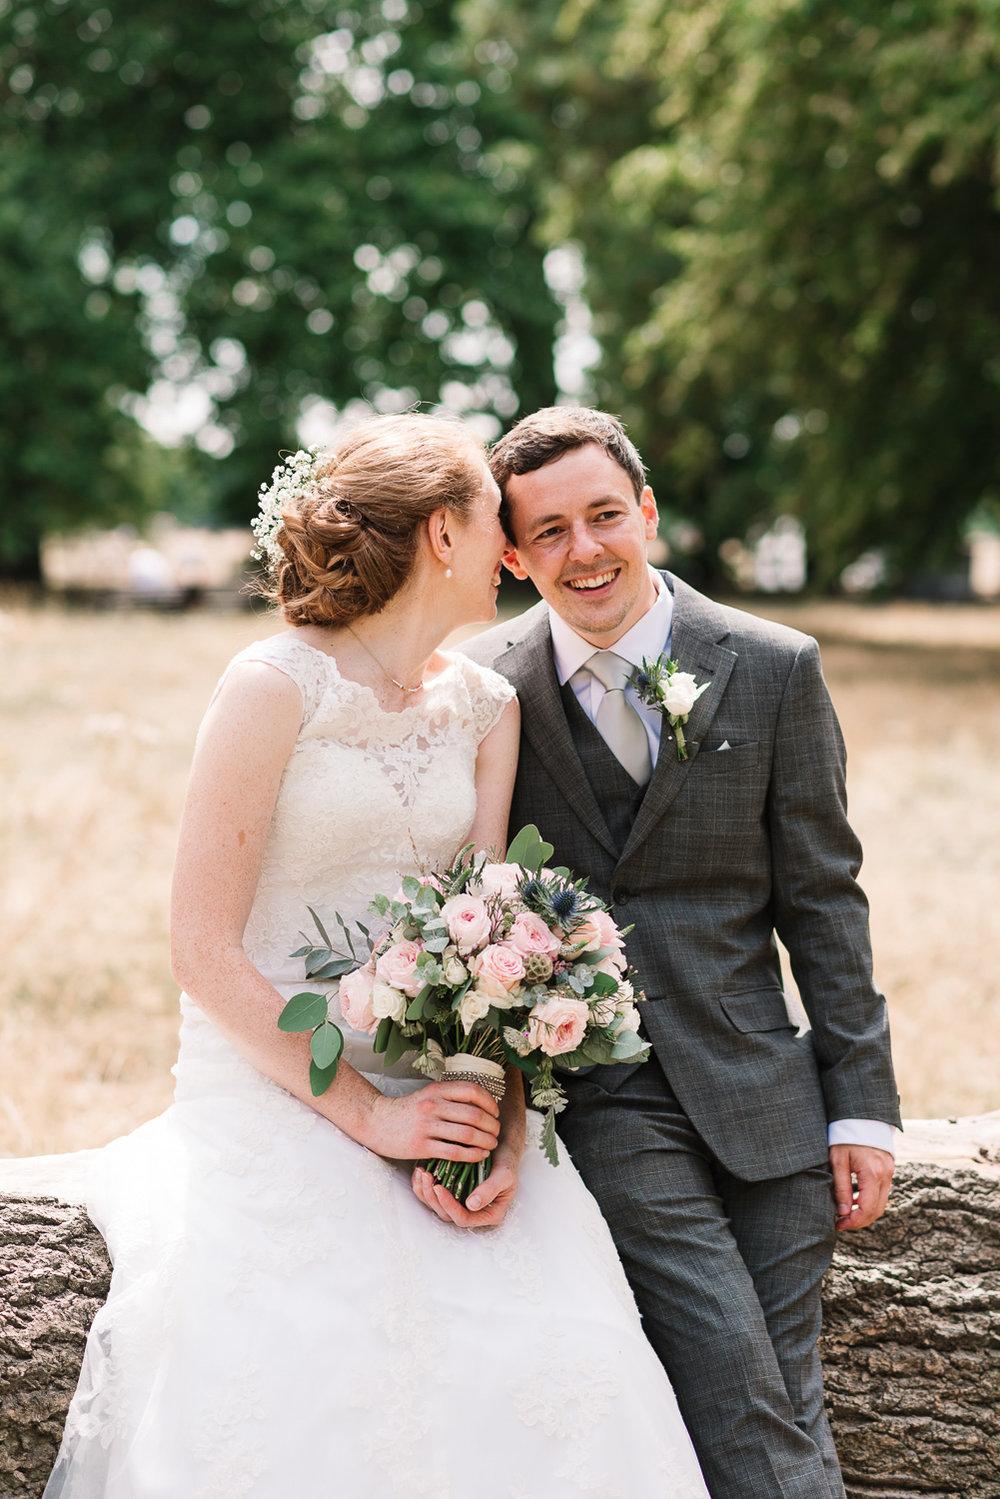 clapham-london-wedding-photographer-38.jpg